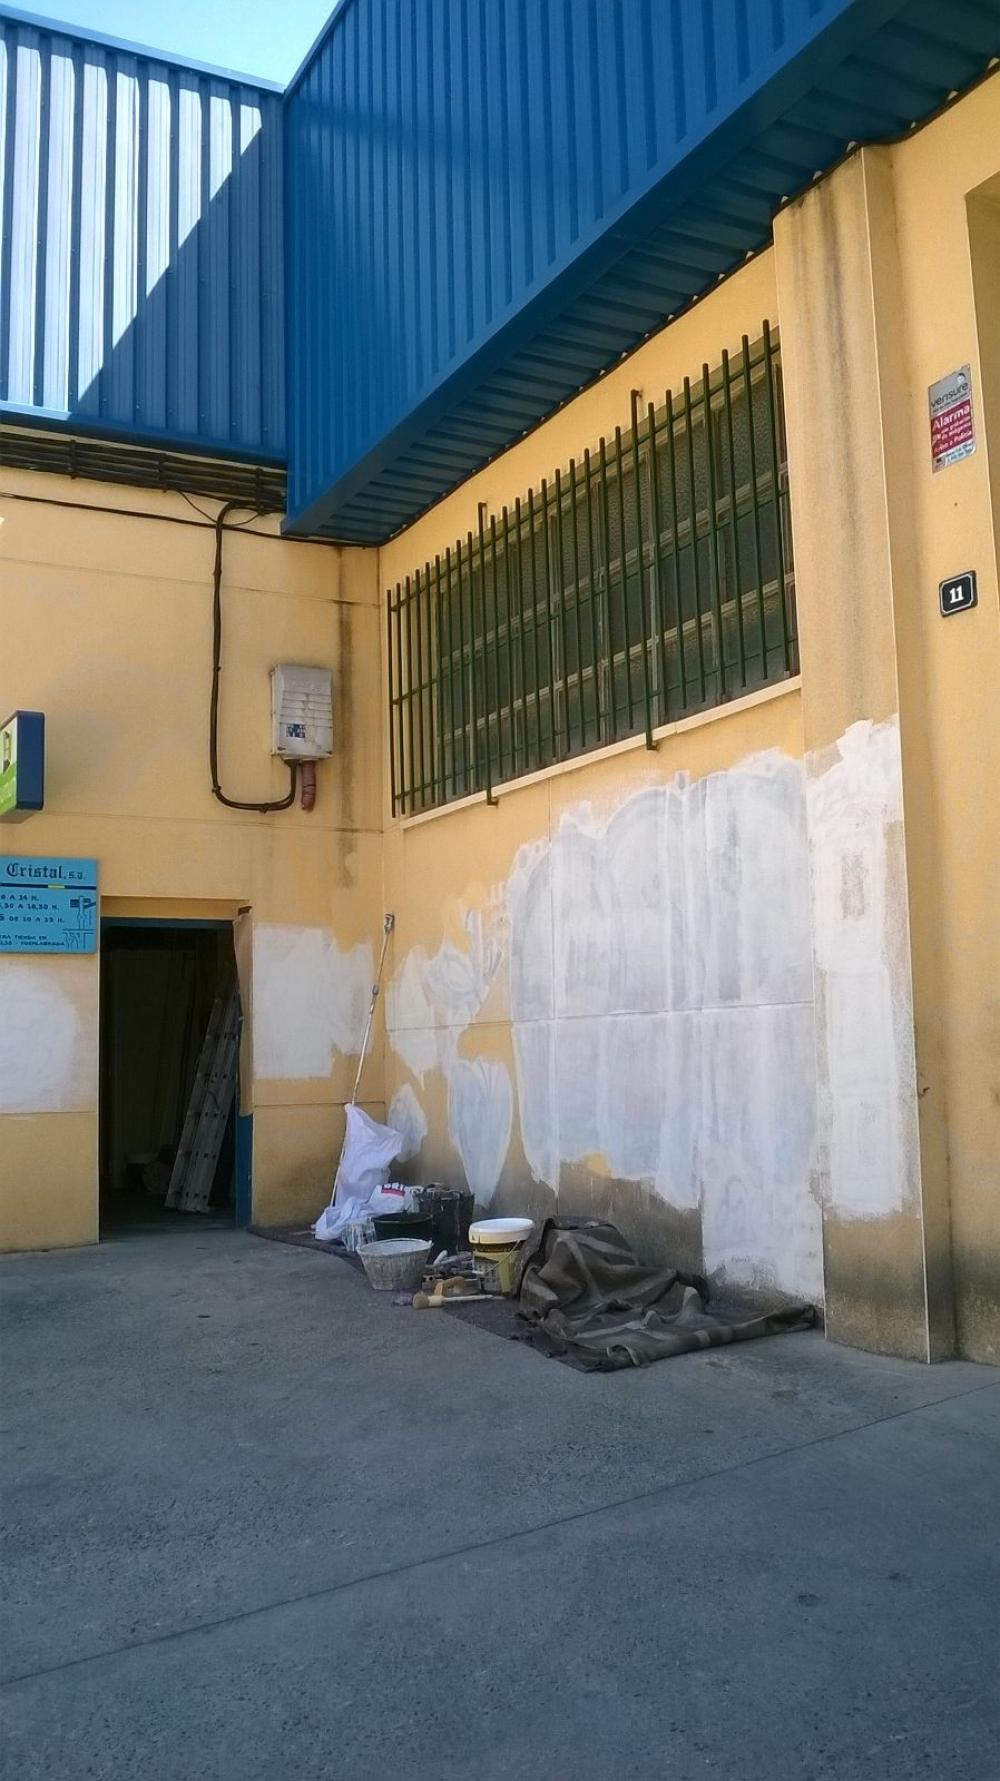 Empresa pintores madrid stunning pintores empresa madrid - Pintores de madrid ...